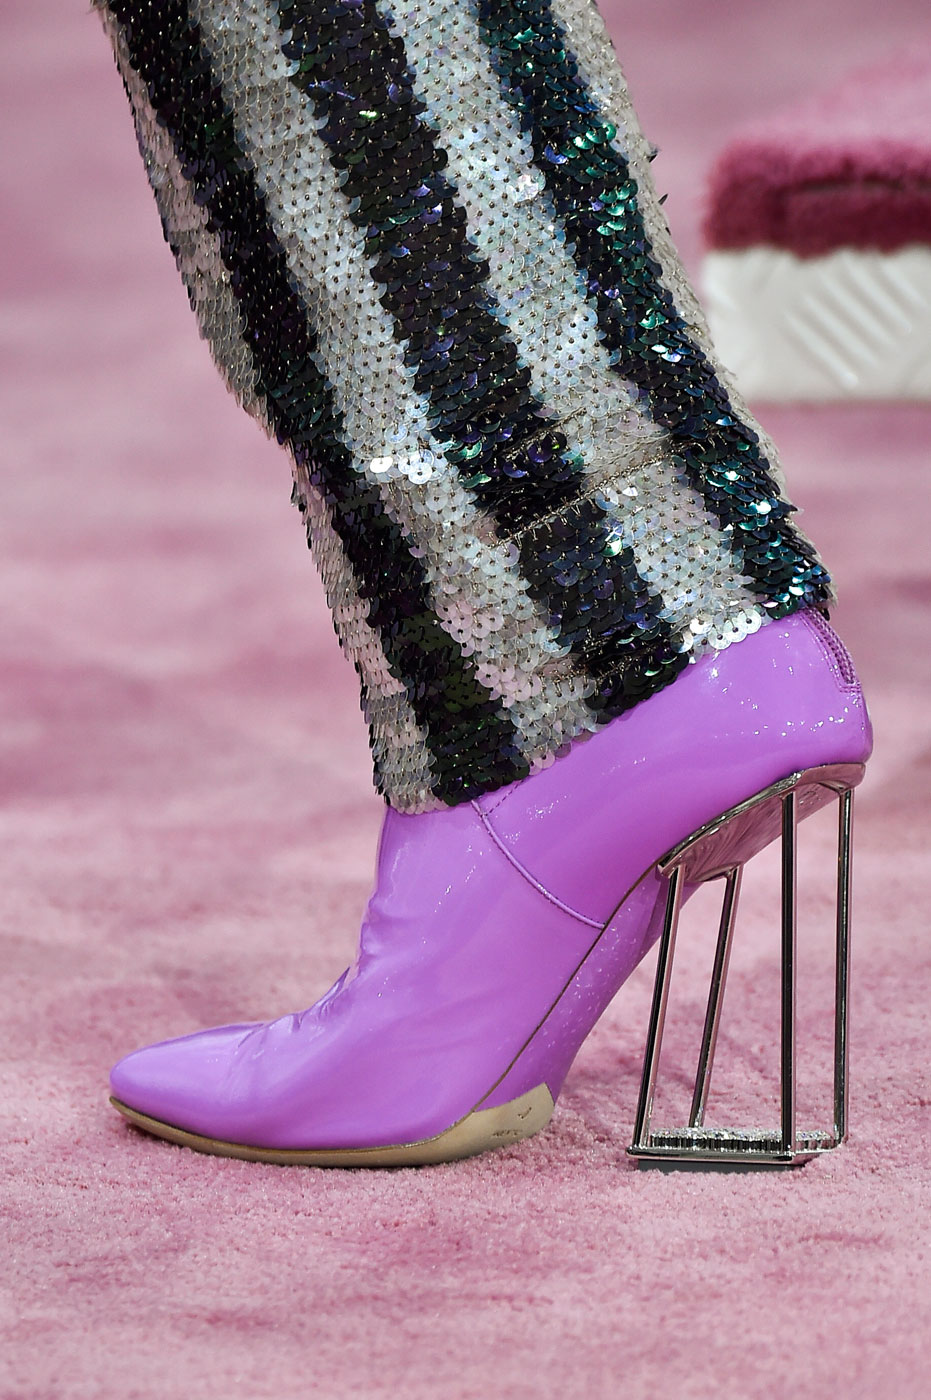 Christian-Dior-fashion-runway-show-close-ups-haute-couture-paris-spring-summer-2015-the-impression-110